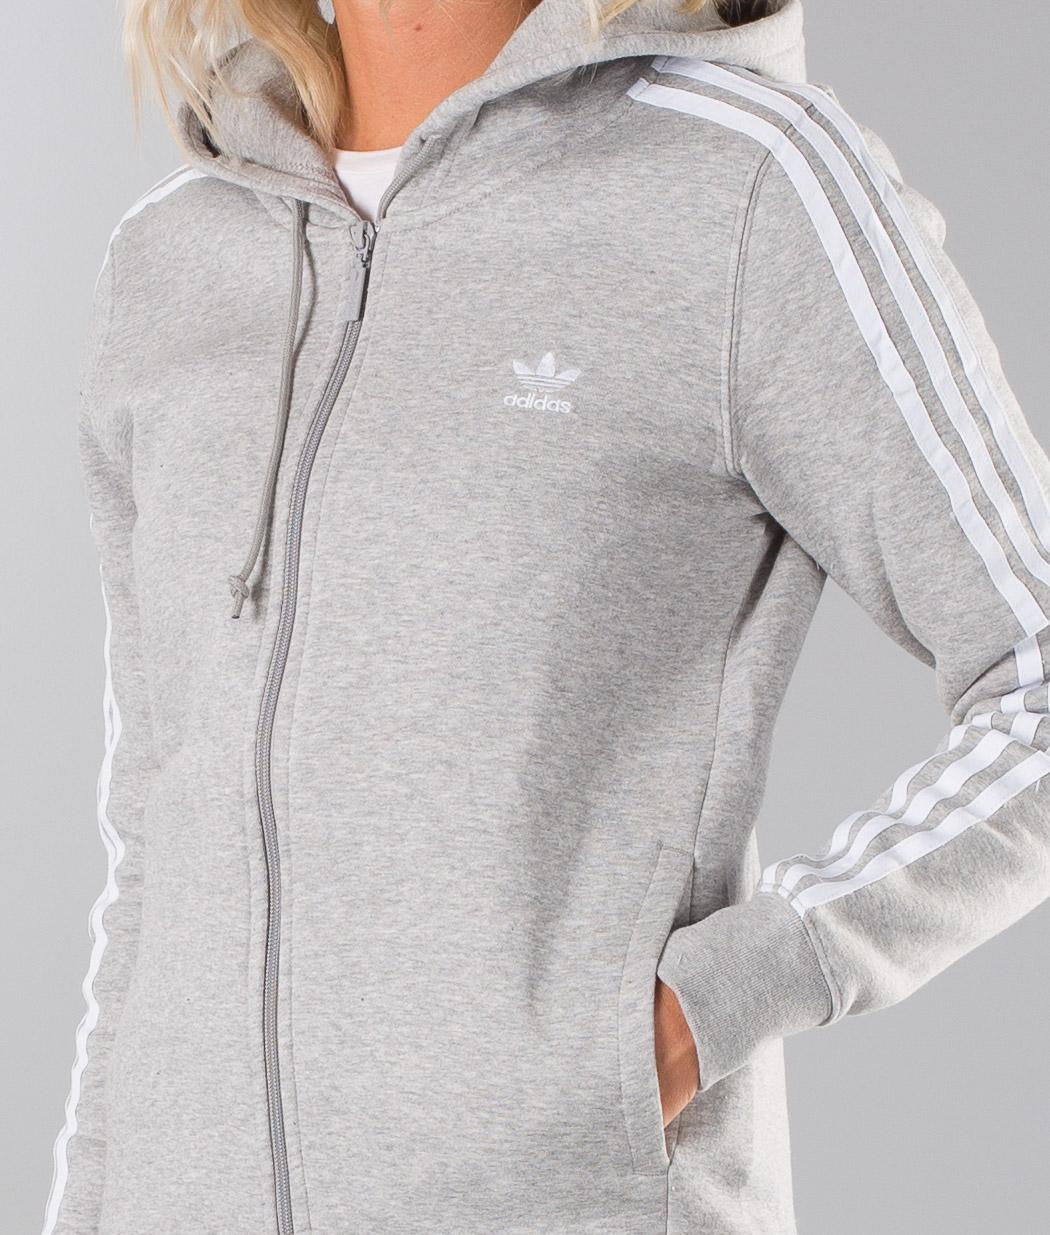 Adidas Originals 3Stripe Hoodie Medium Grey Heather